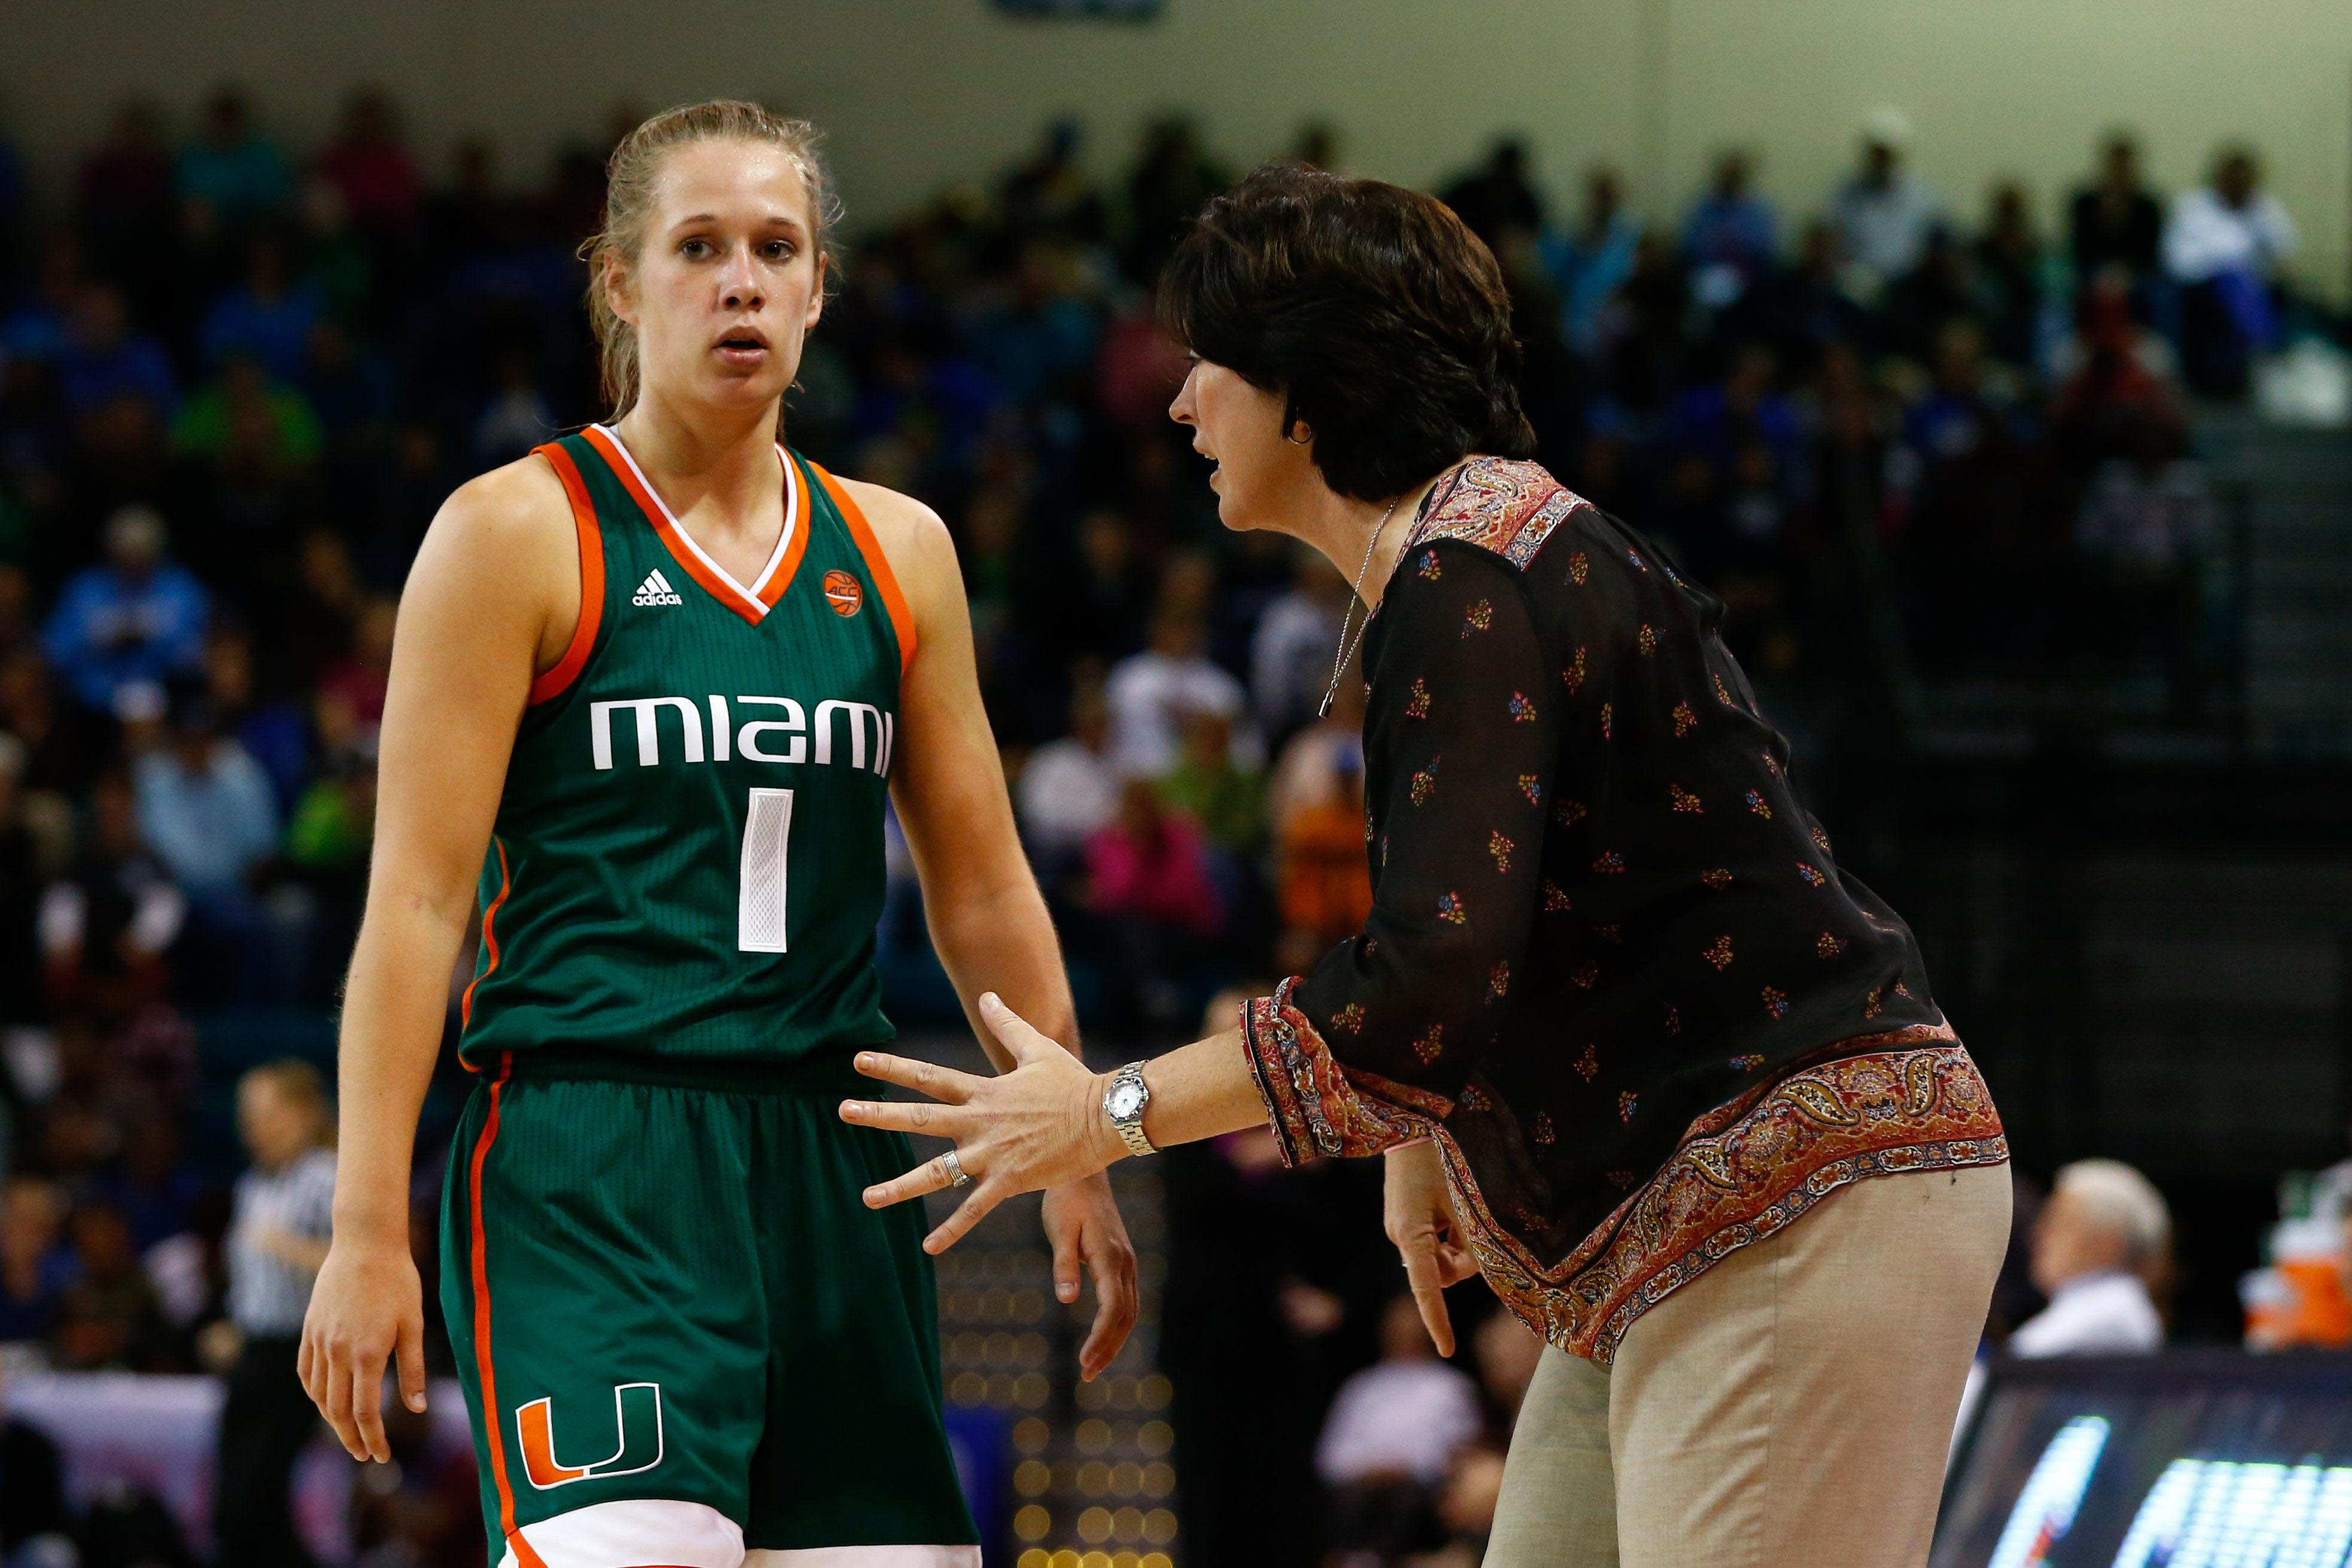 9915870-ncaa-womens-basketball-acc-conference-tournament-duke-vs-miami